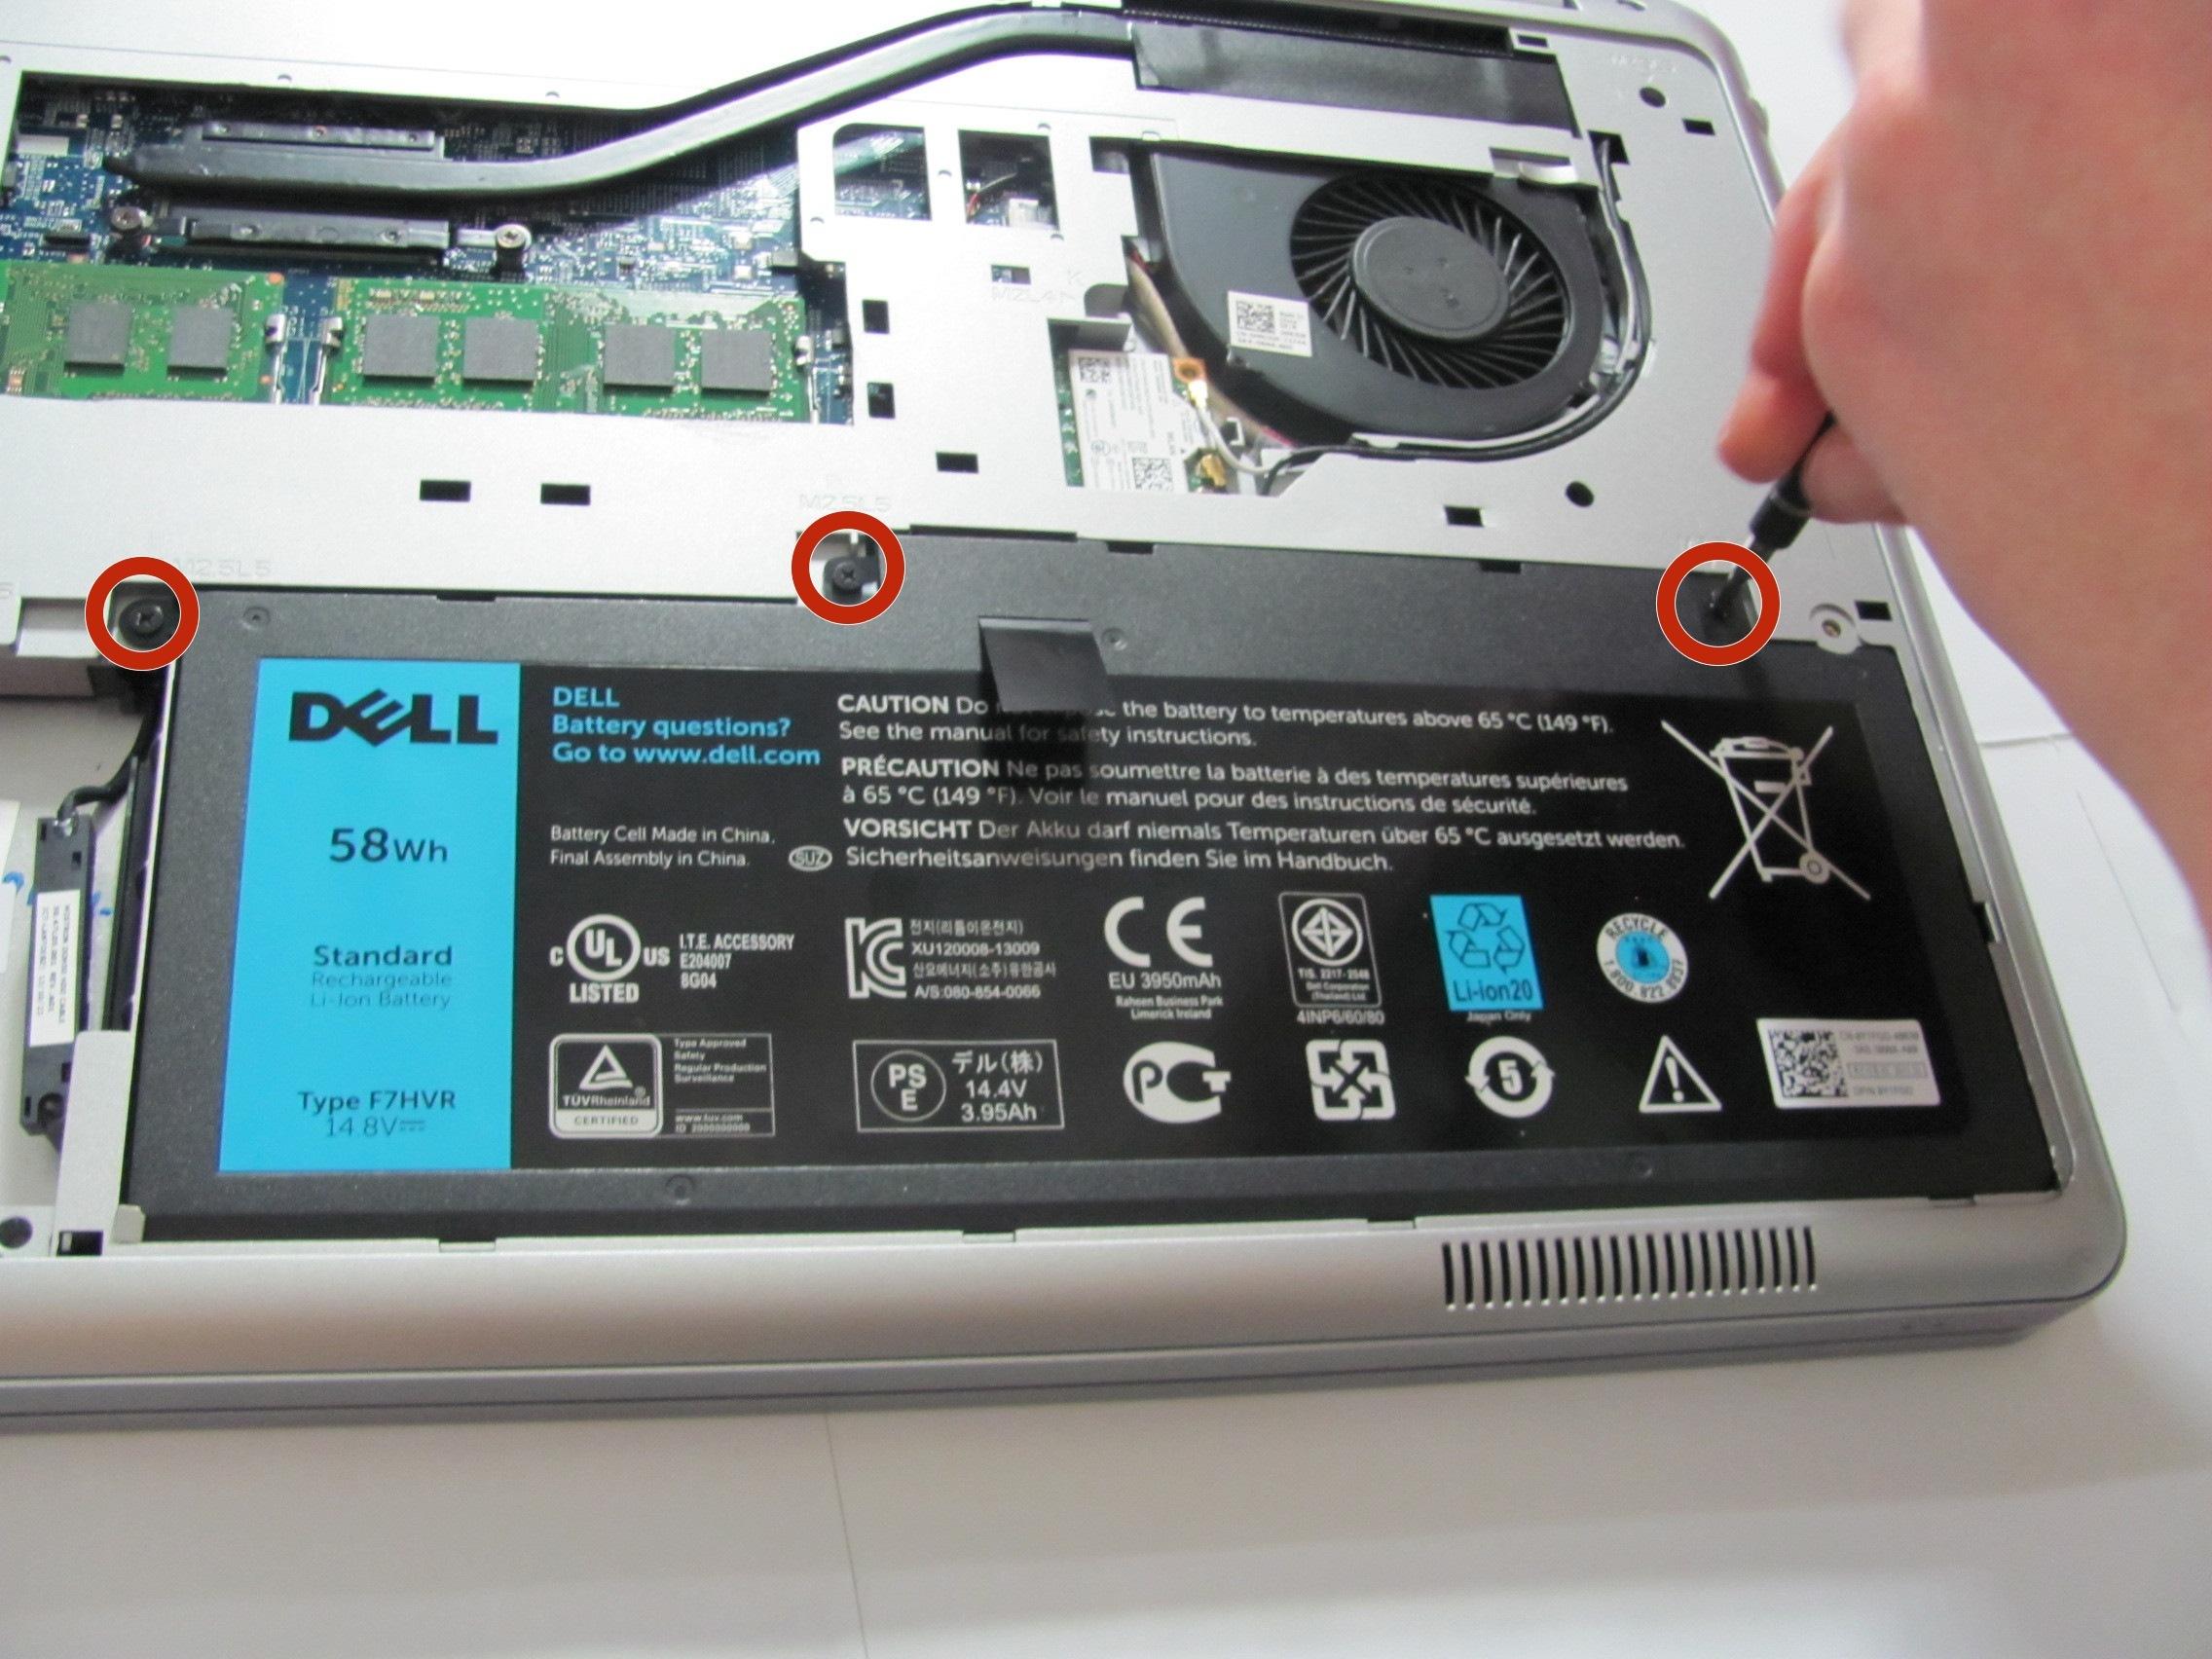 Dell Inspiron 15-7537 Repair - iFixit